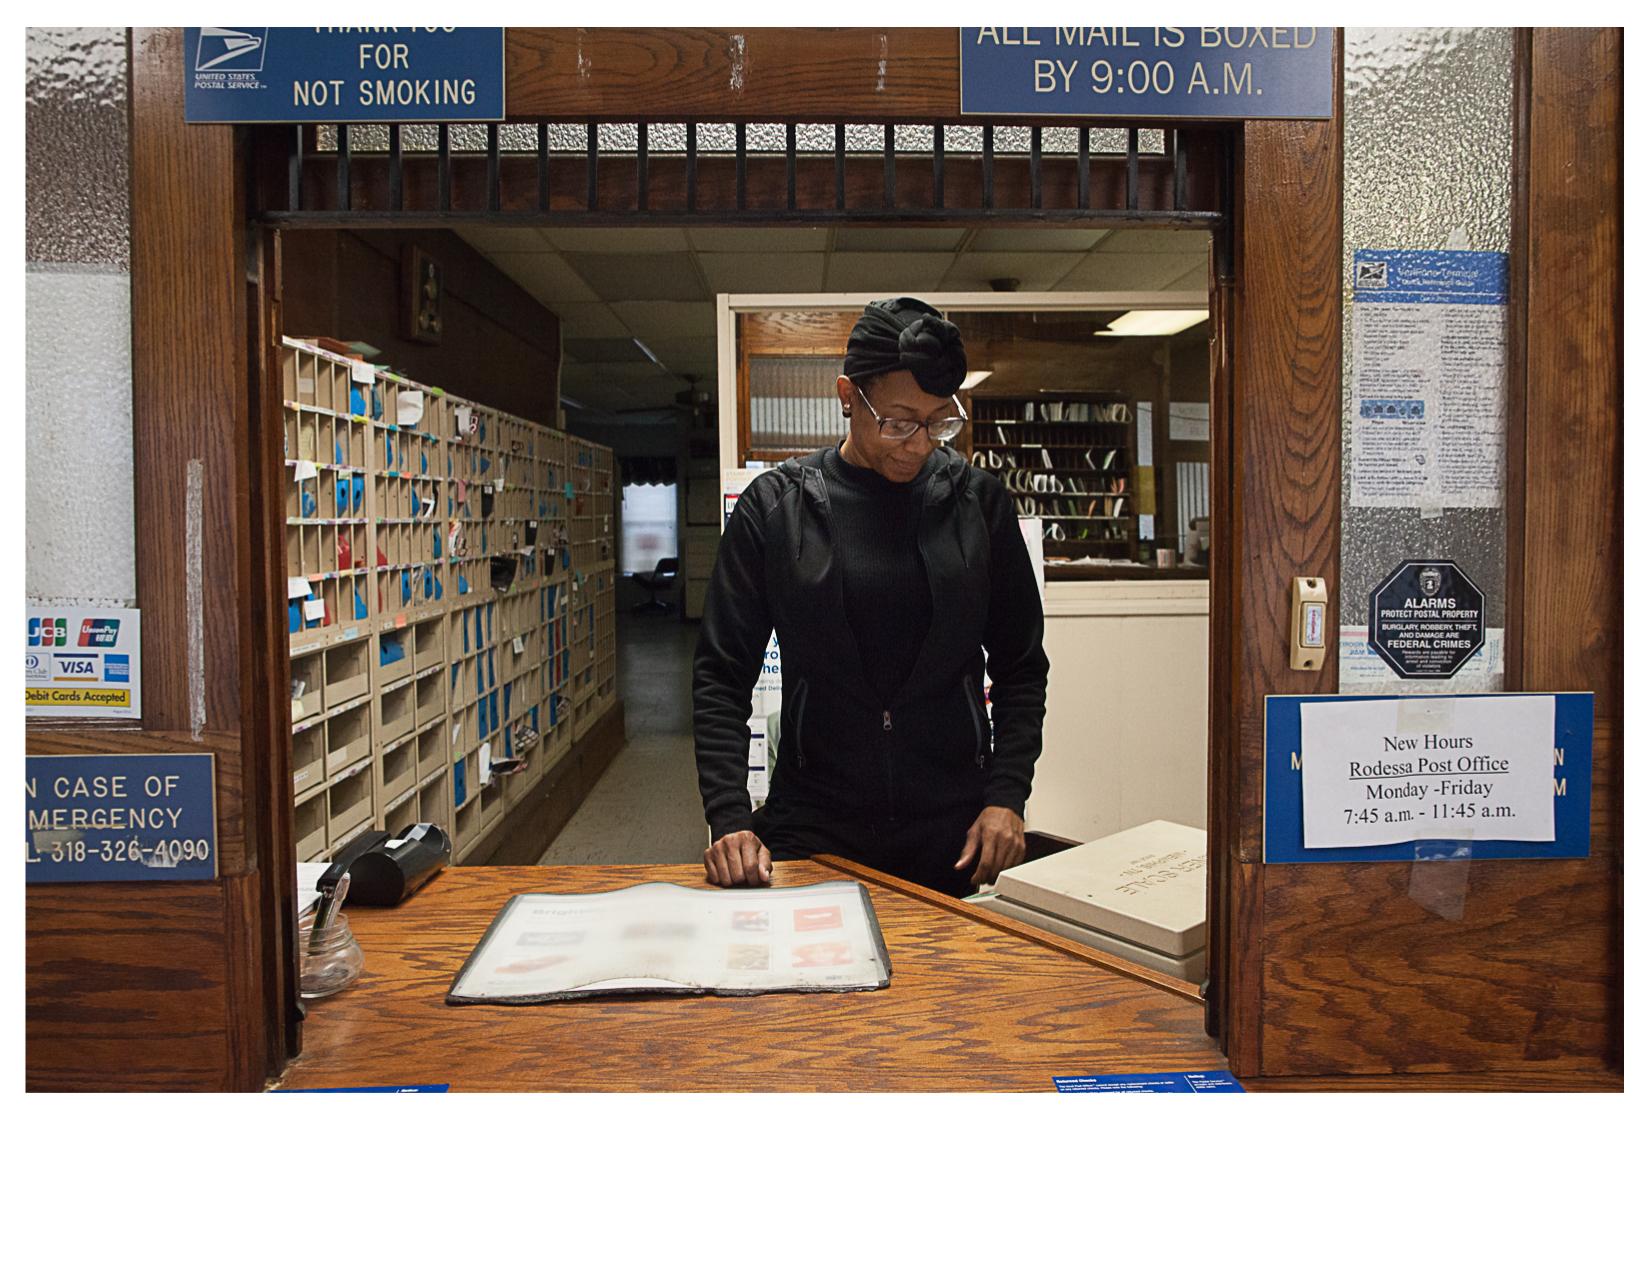 Wilyolanda, Post Office, Rodessa, LA